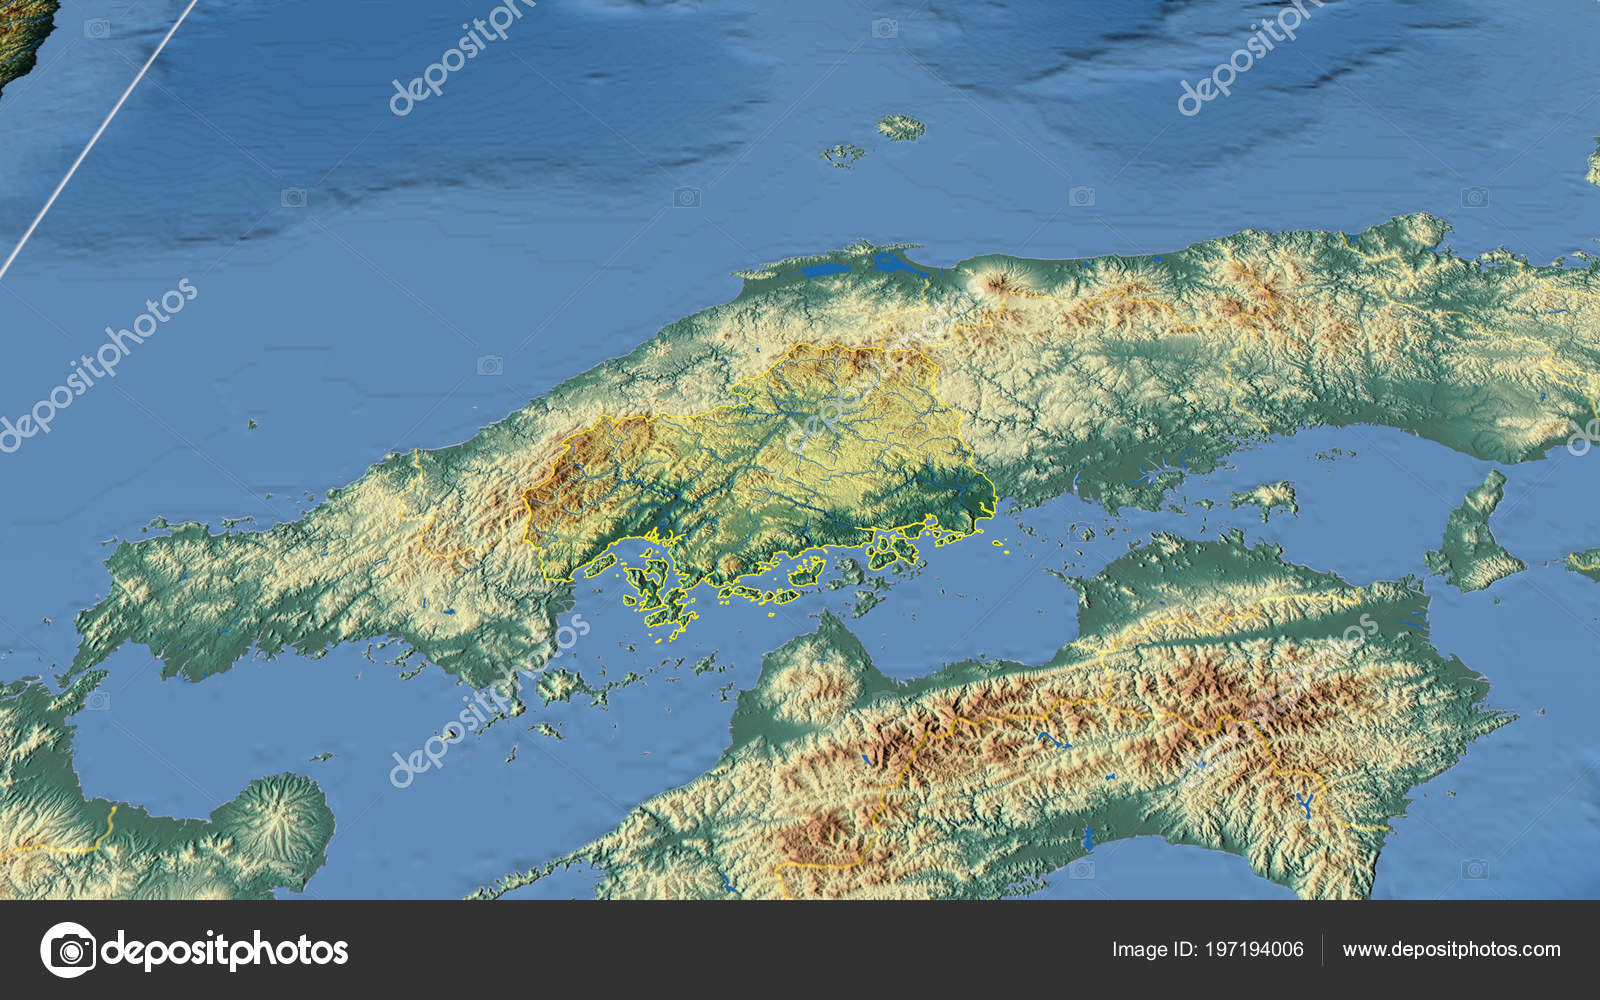 Japan Karte Physisch.Hiroshima Region Japan Beschrieben Physische Karte Der Farbe